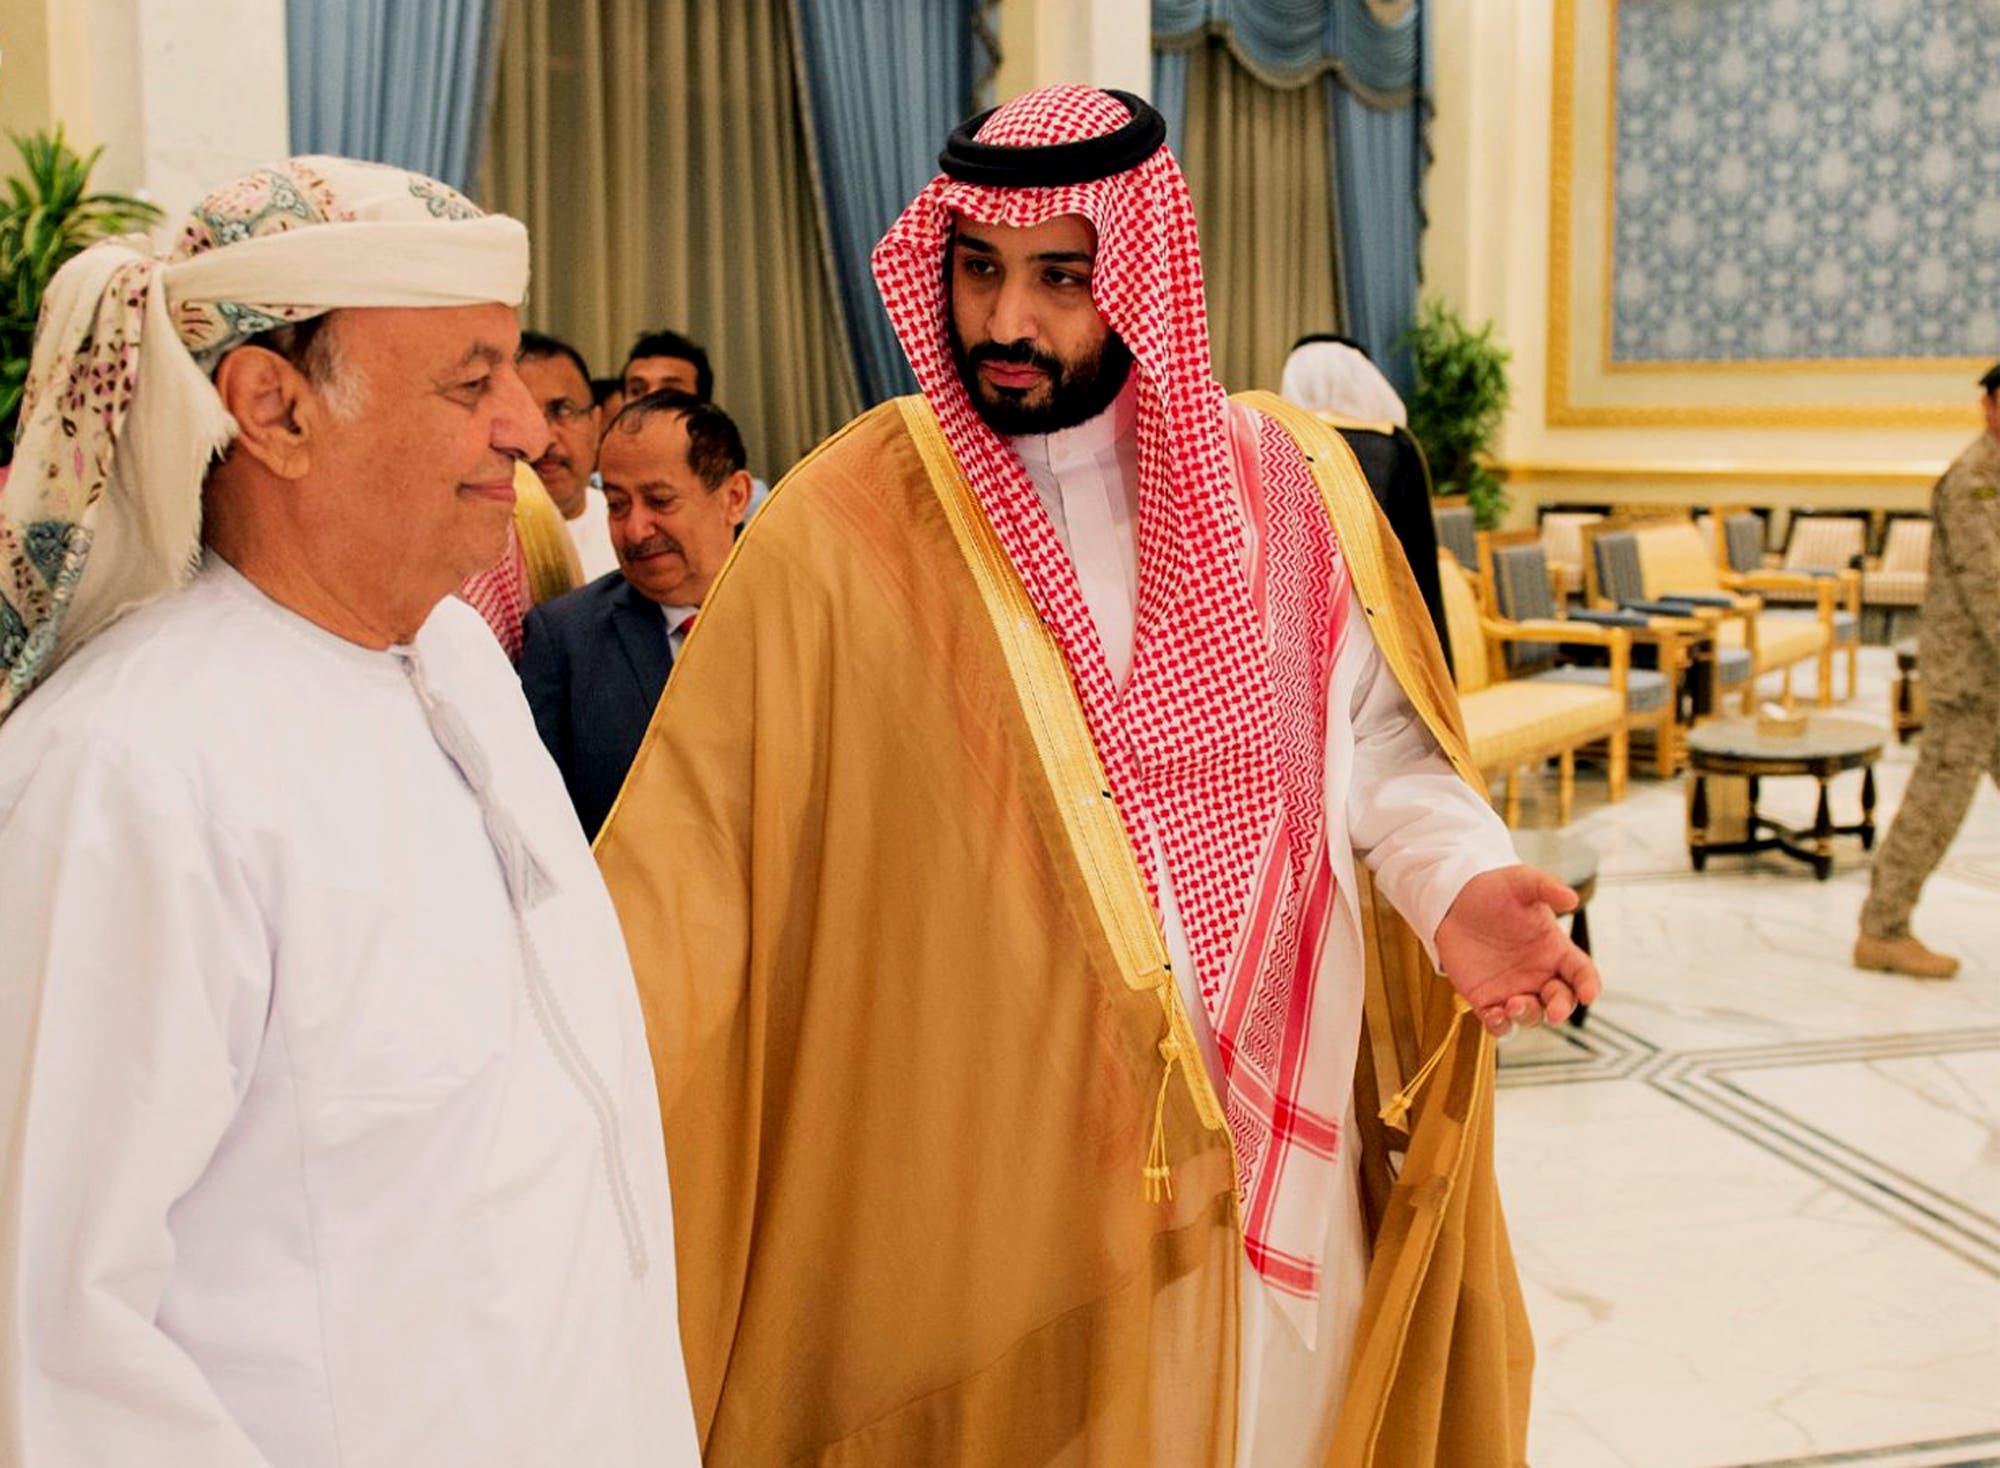 n this Thursday, March 26, 2015 file photo, provided by the Saudi Press Agency (SPA), Yemen's President Abed Rabbo Mansour Hadi, left, walks with Saudi Defense Minister Mohammed bin Salman as Hadi arrives in Riyadh, Saudi Arabia. (AP)